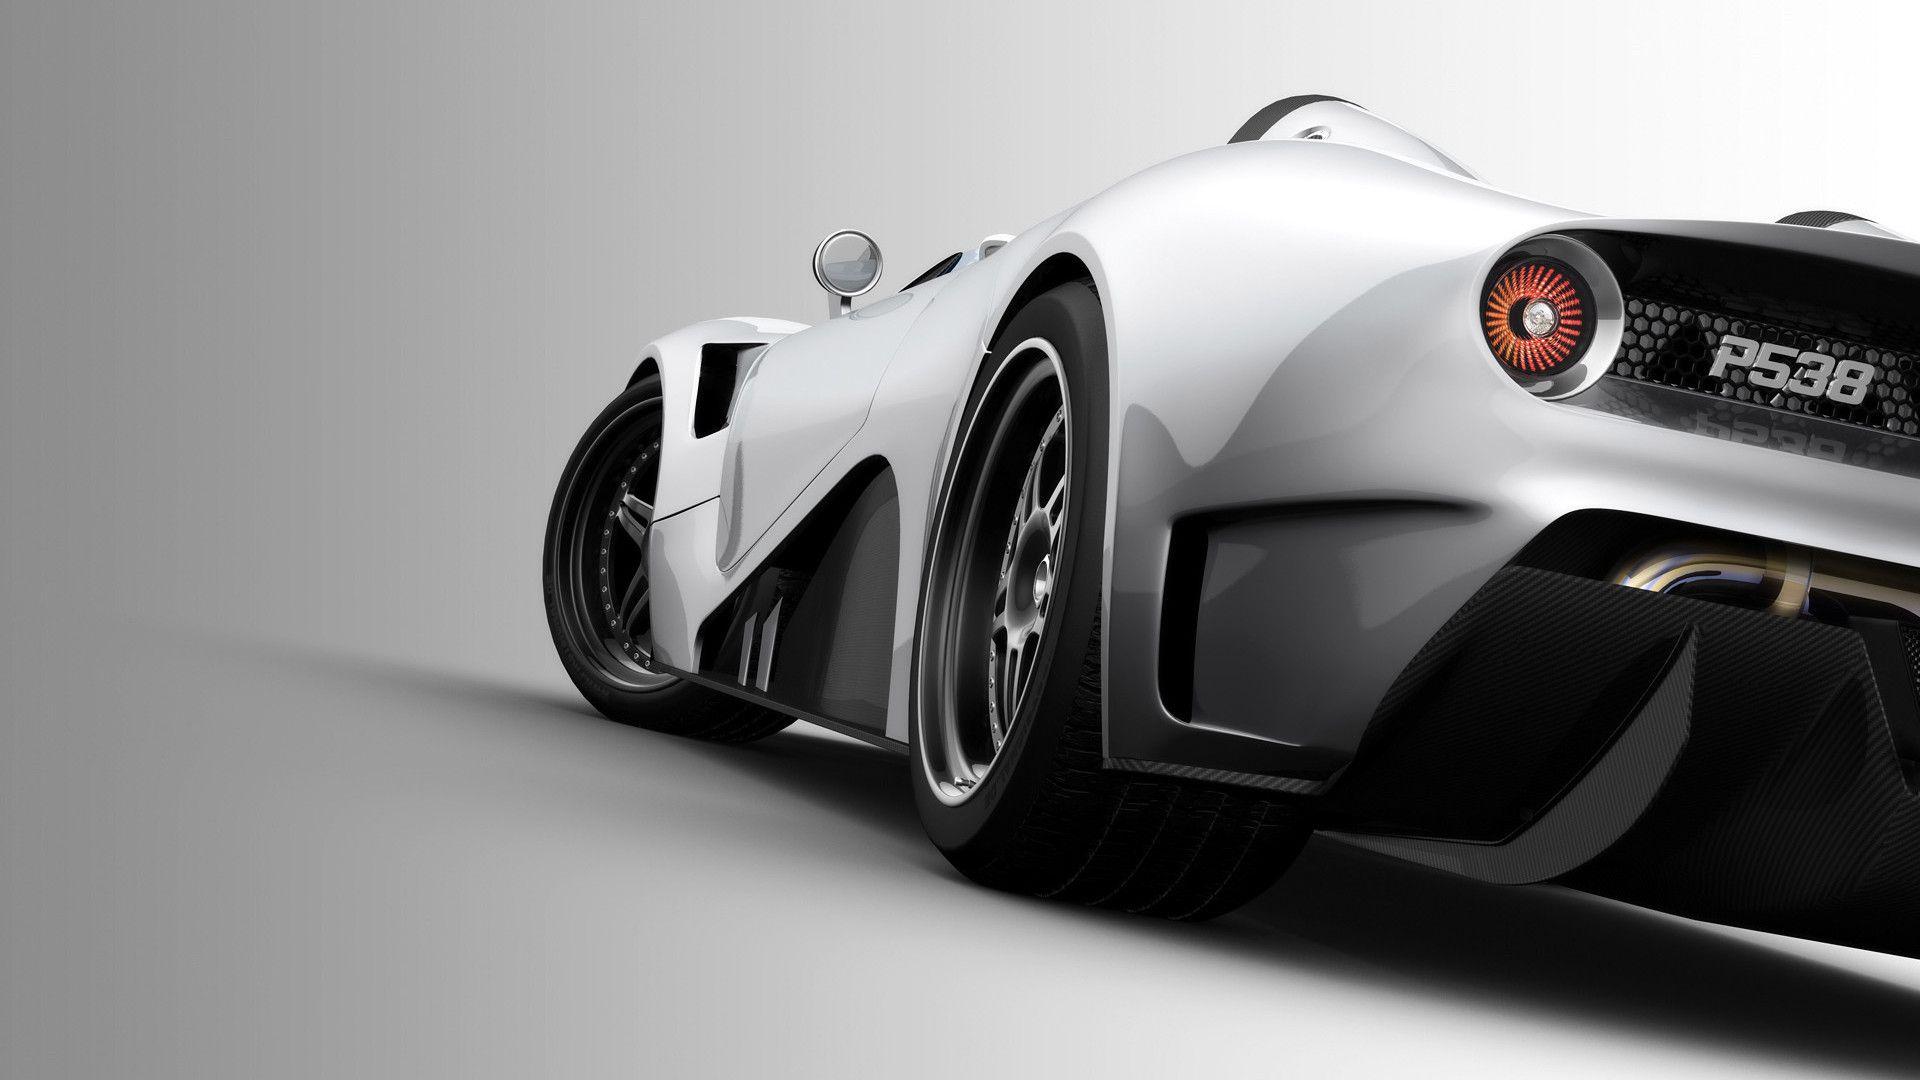 Ferrari Full Hd Wallpaper Cars Full Hd Backgrounds 1080p Pixelstalk Net